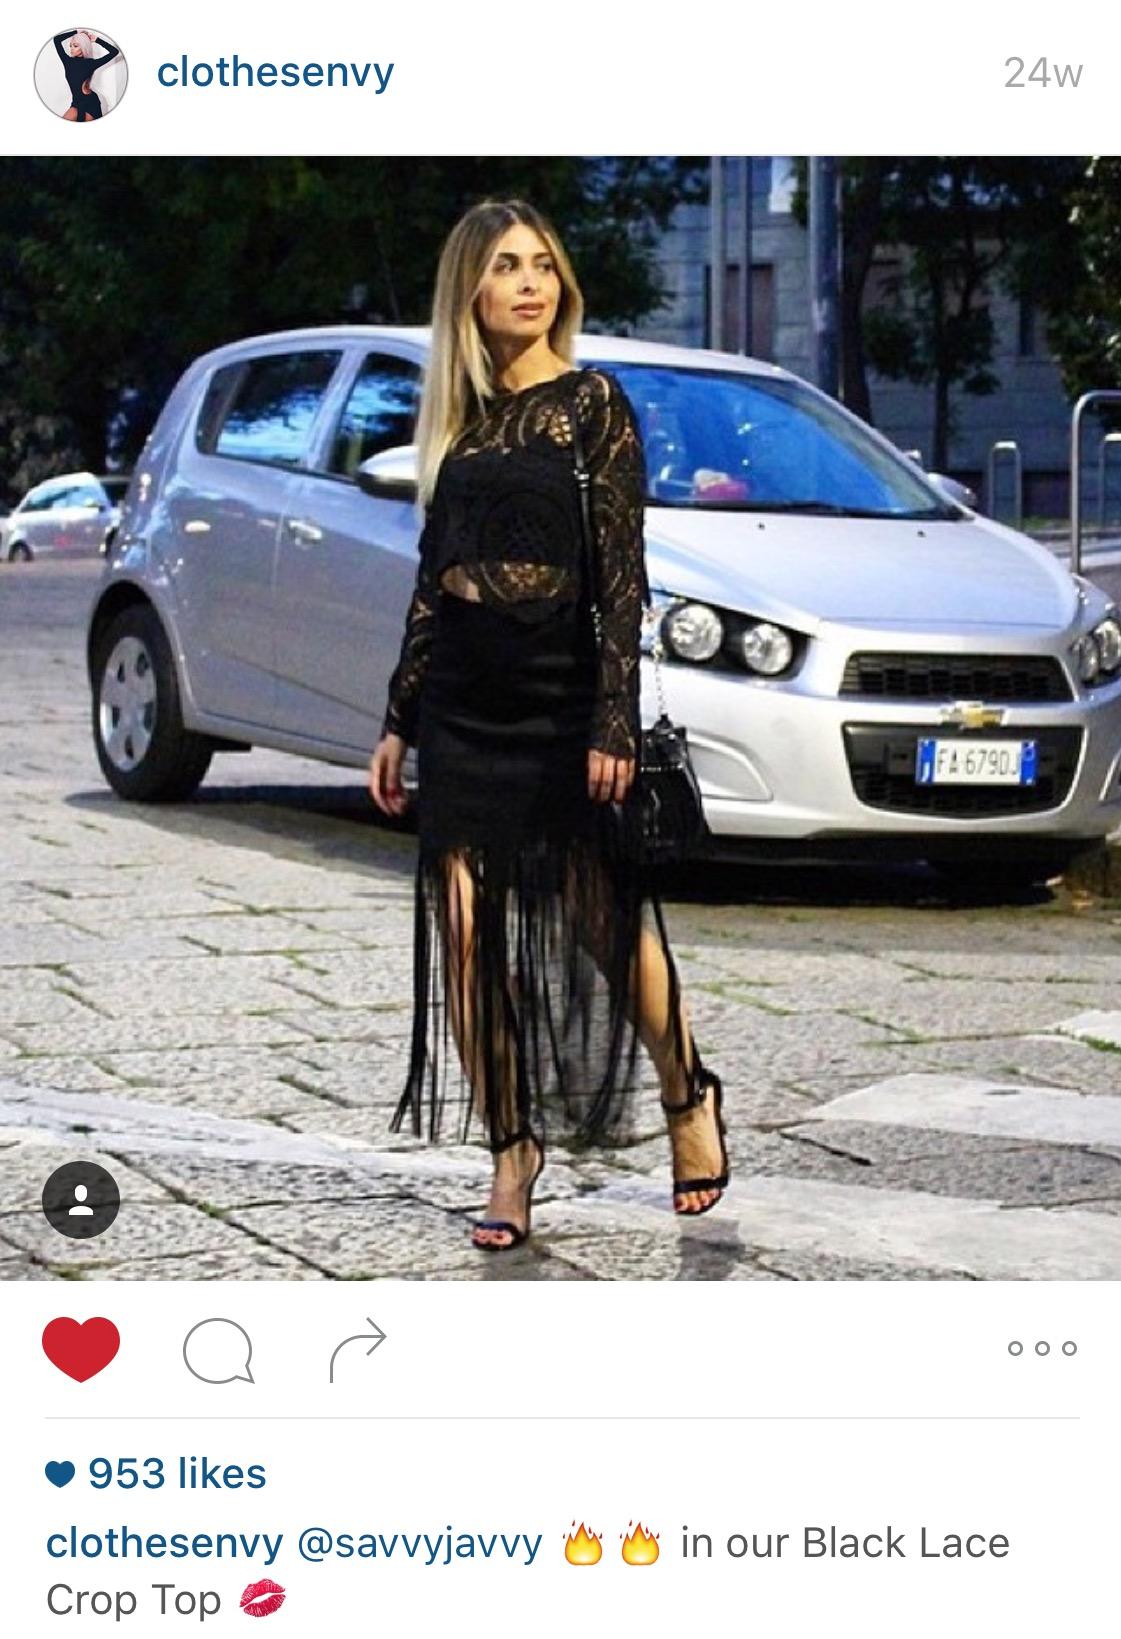 Clothes Envy Instagram